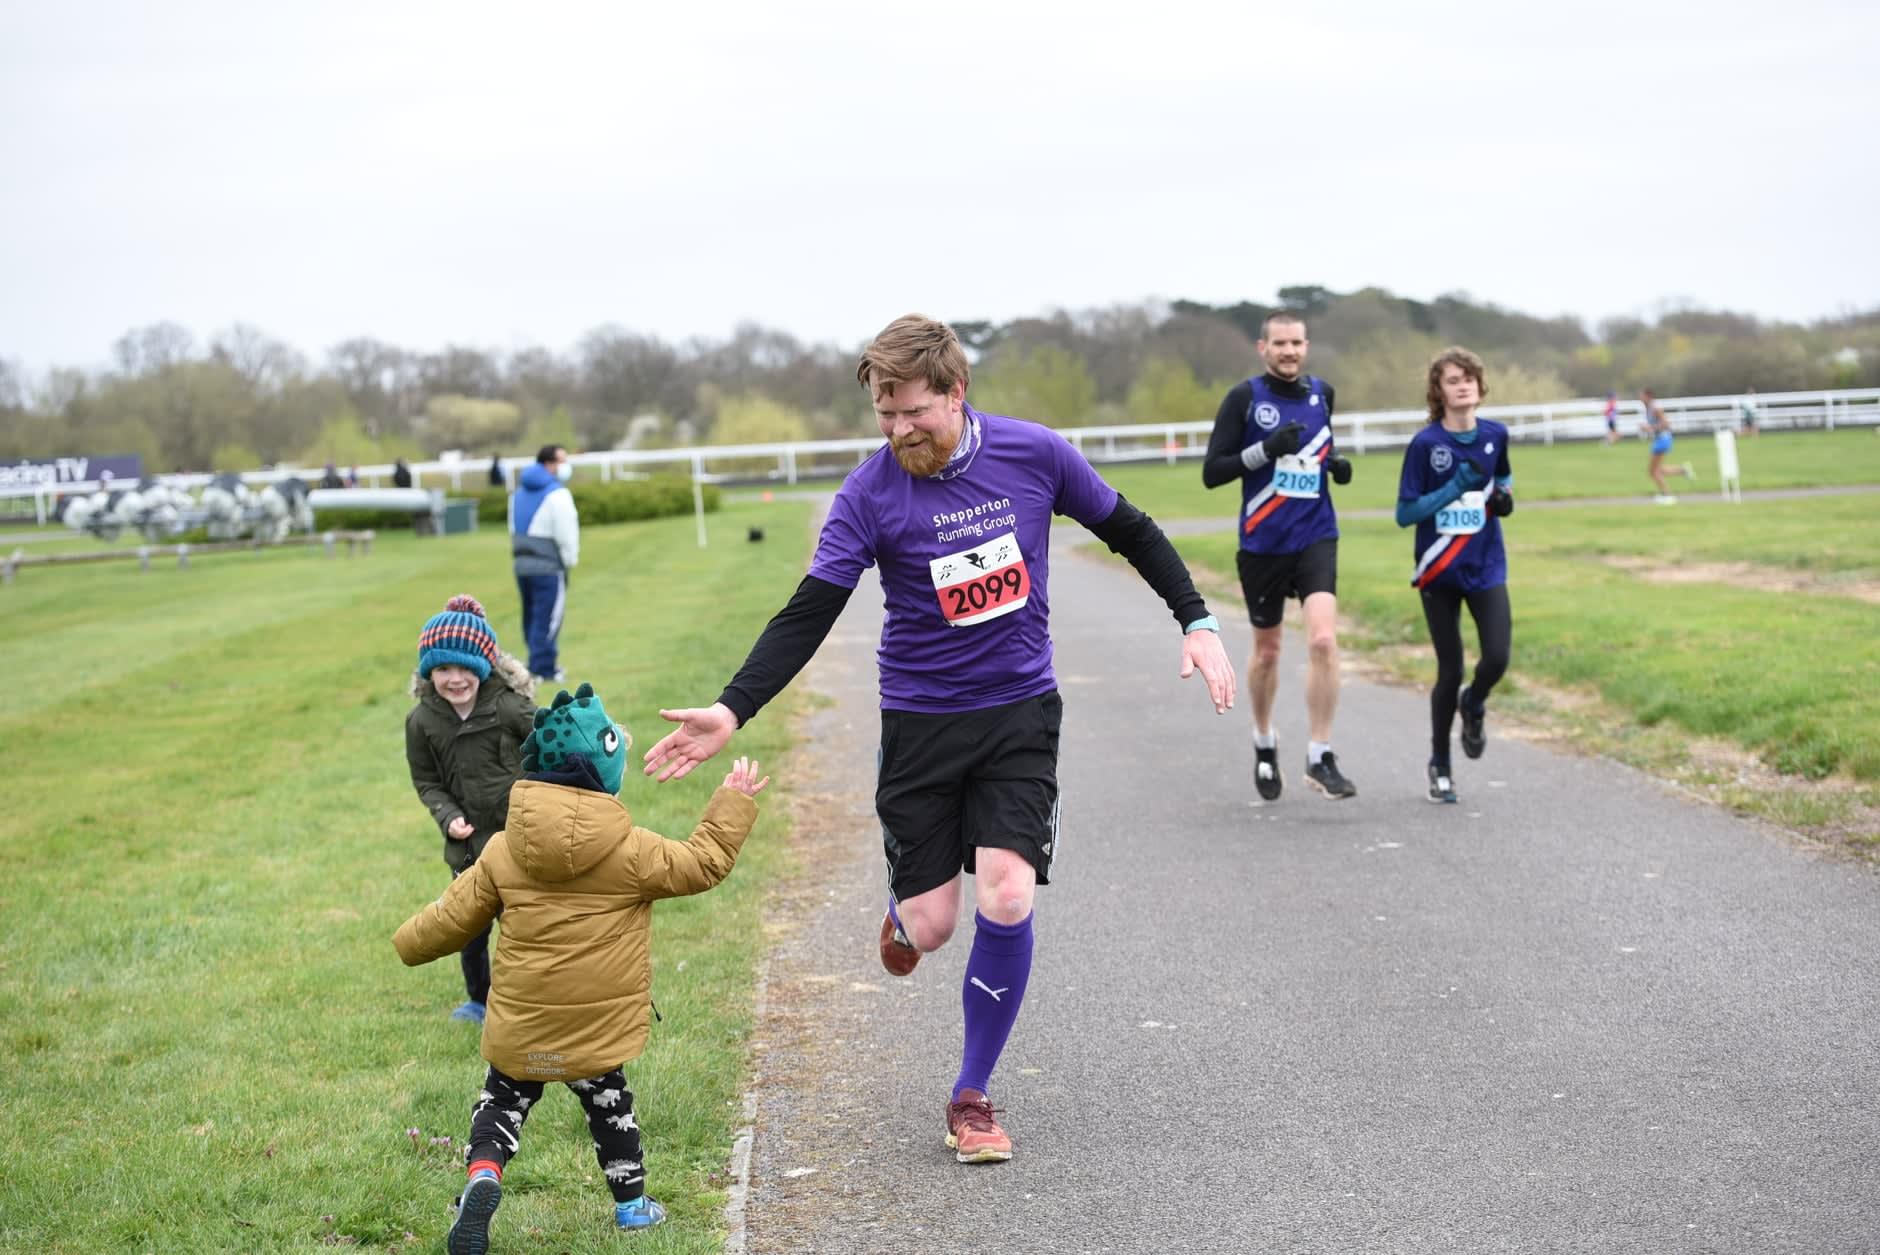 Kempton Park 5k, 10k & Half Marathon - January